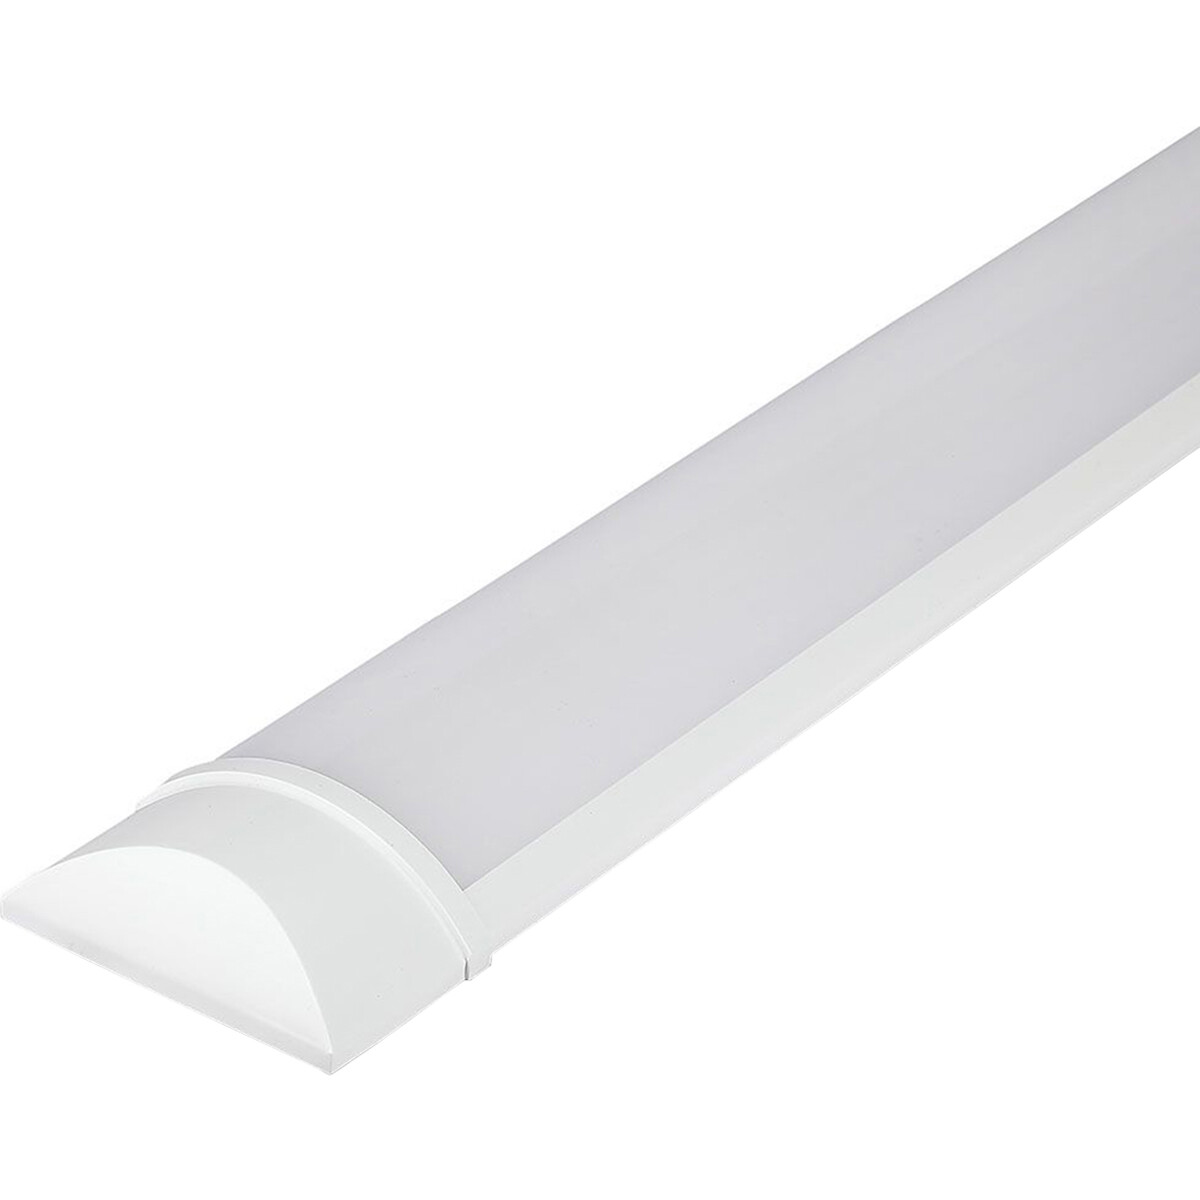 SAMSUNG - LED Balk - Viron Lavaz - 10W High Lumen - Natuurlijk Wit 4000K - Mat Wit - Kunststof - 30c